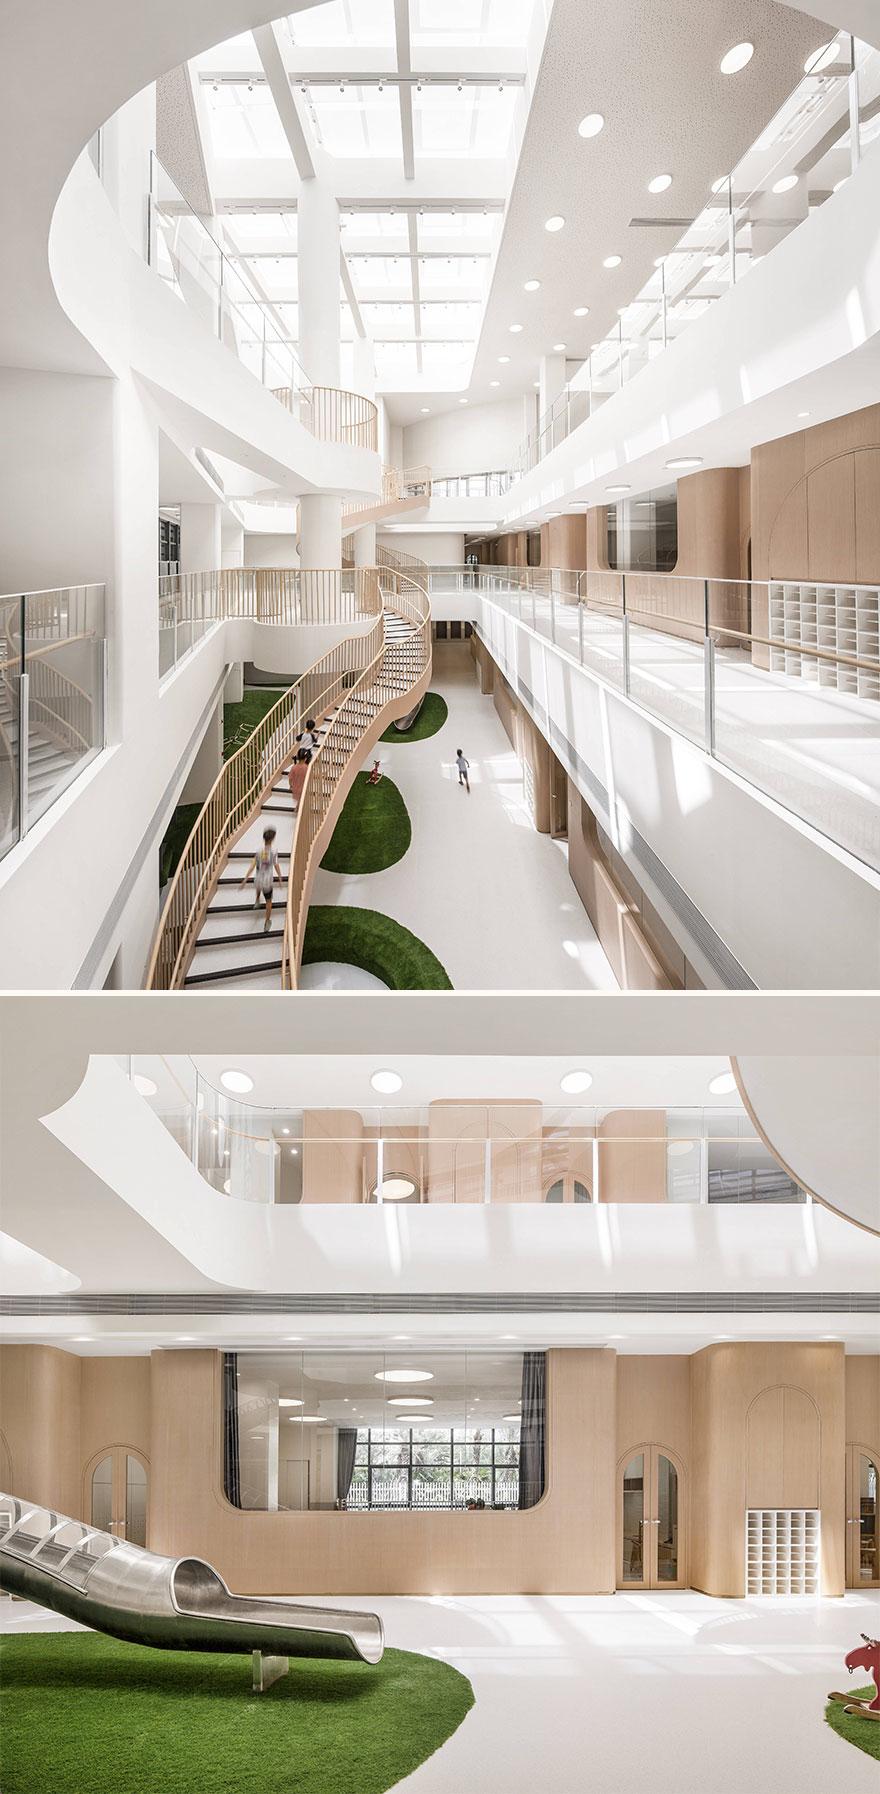 Wandering in the Woods—XinMeng, Montessori Kindergarten (Best In Educational Buildings Architectural Design)